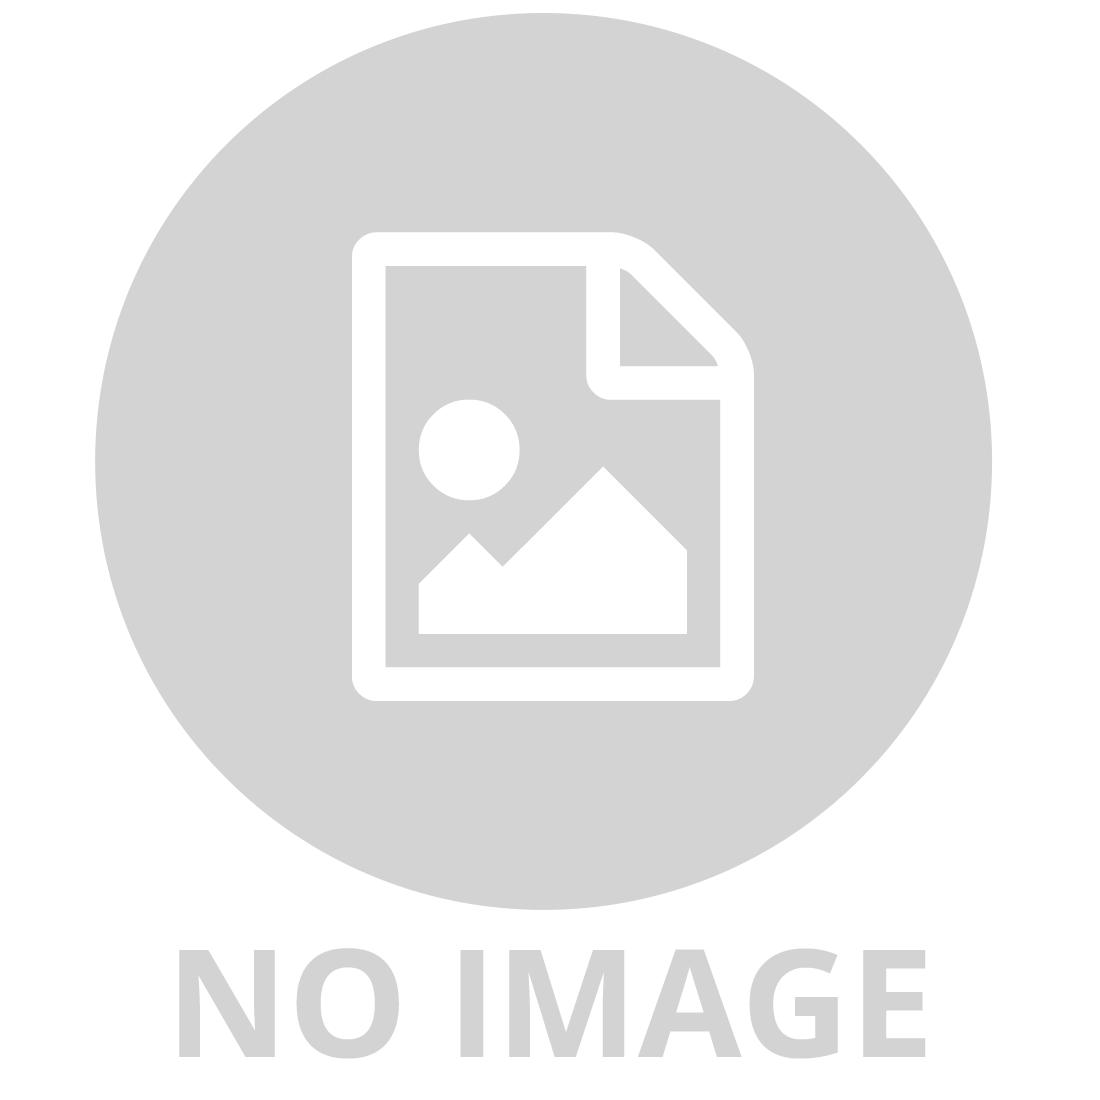 SURE LOX 500PC JIGSAW PUZZLE ALPINE VISTAS MOUNTAIN LAKE RETREAT